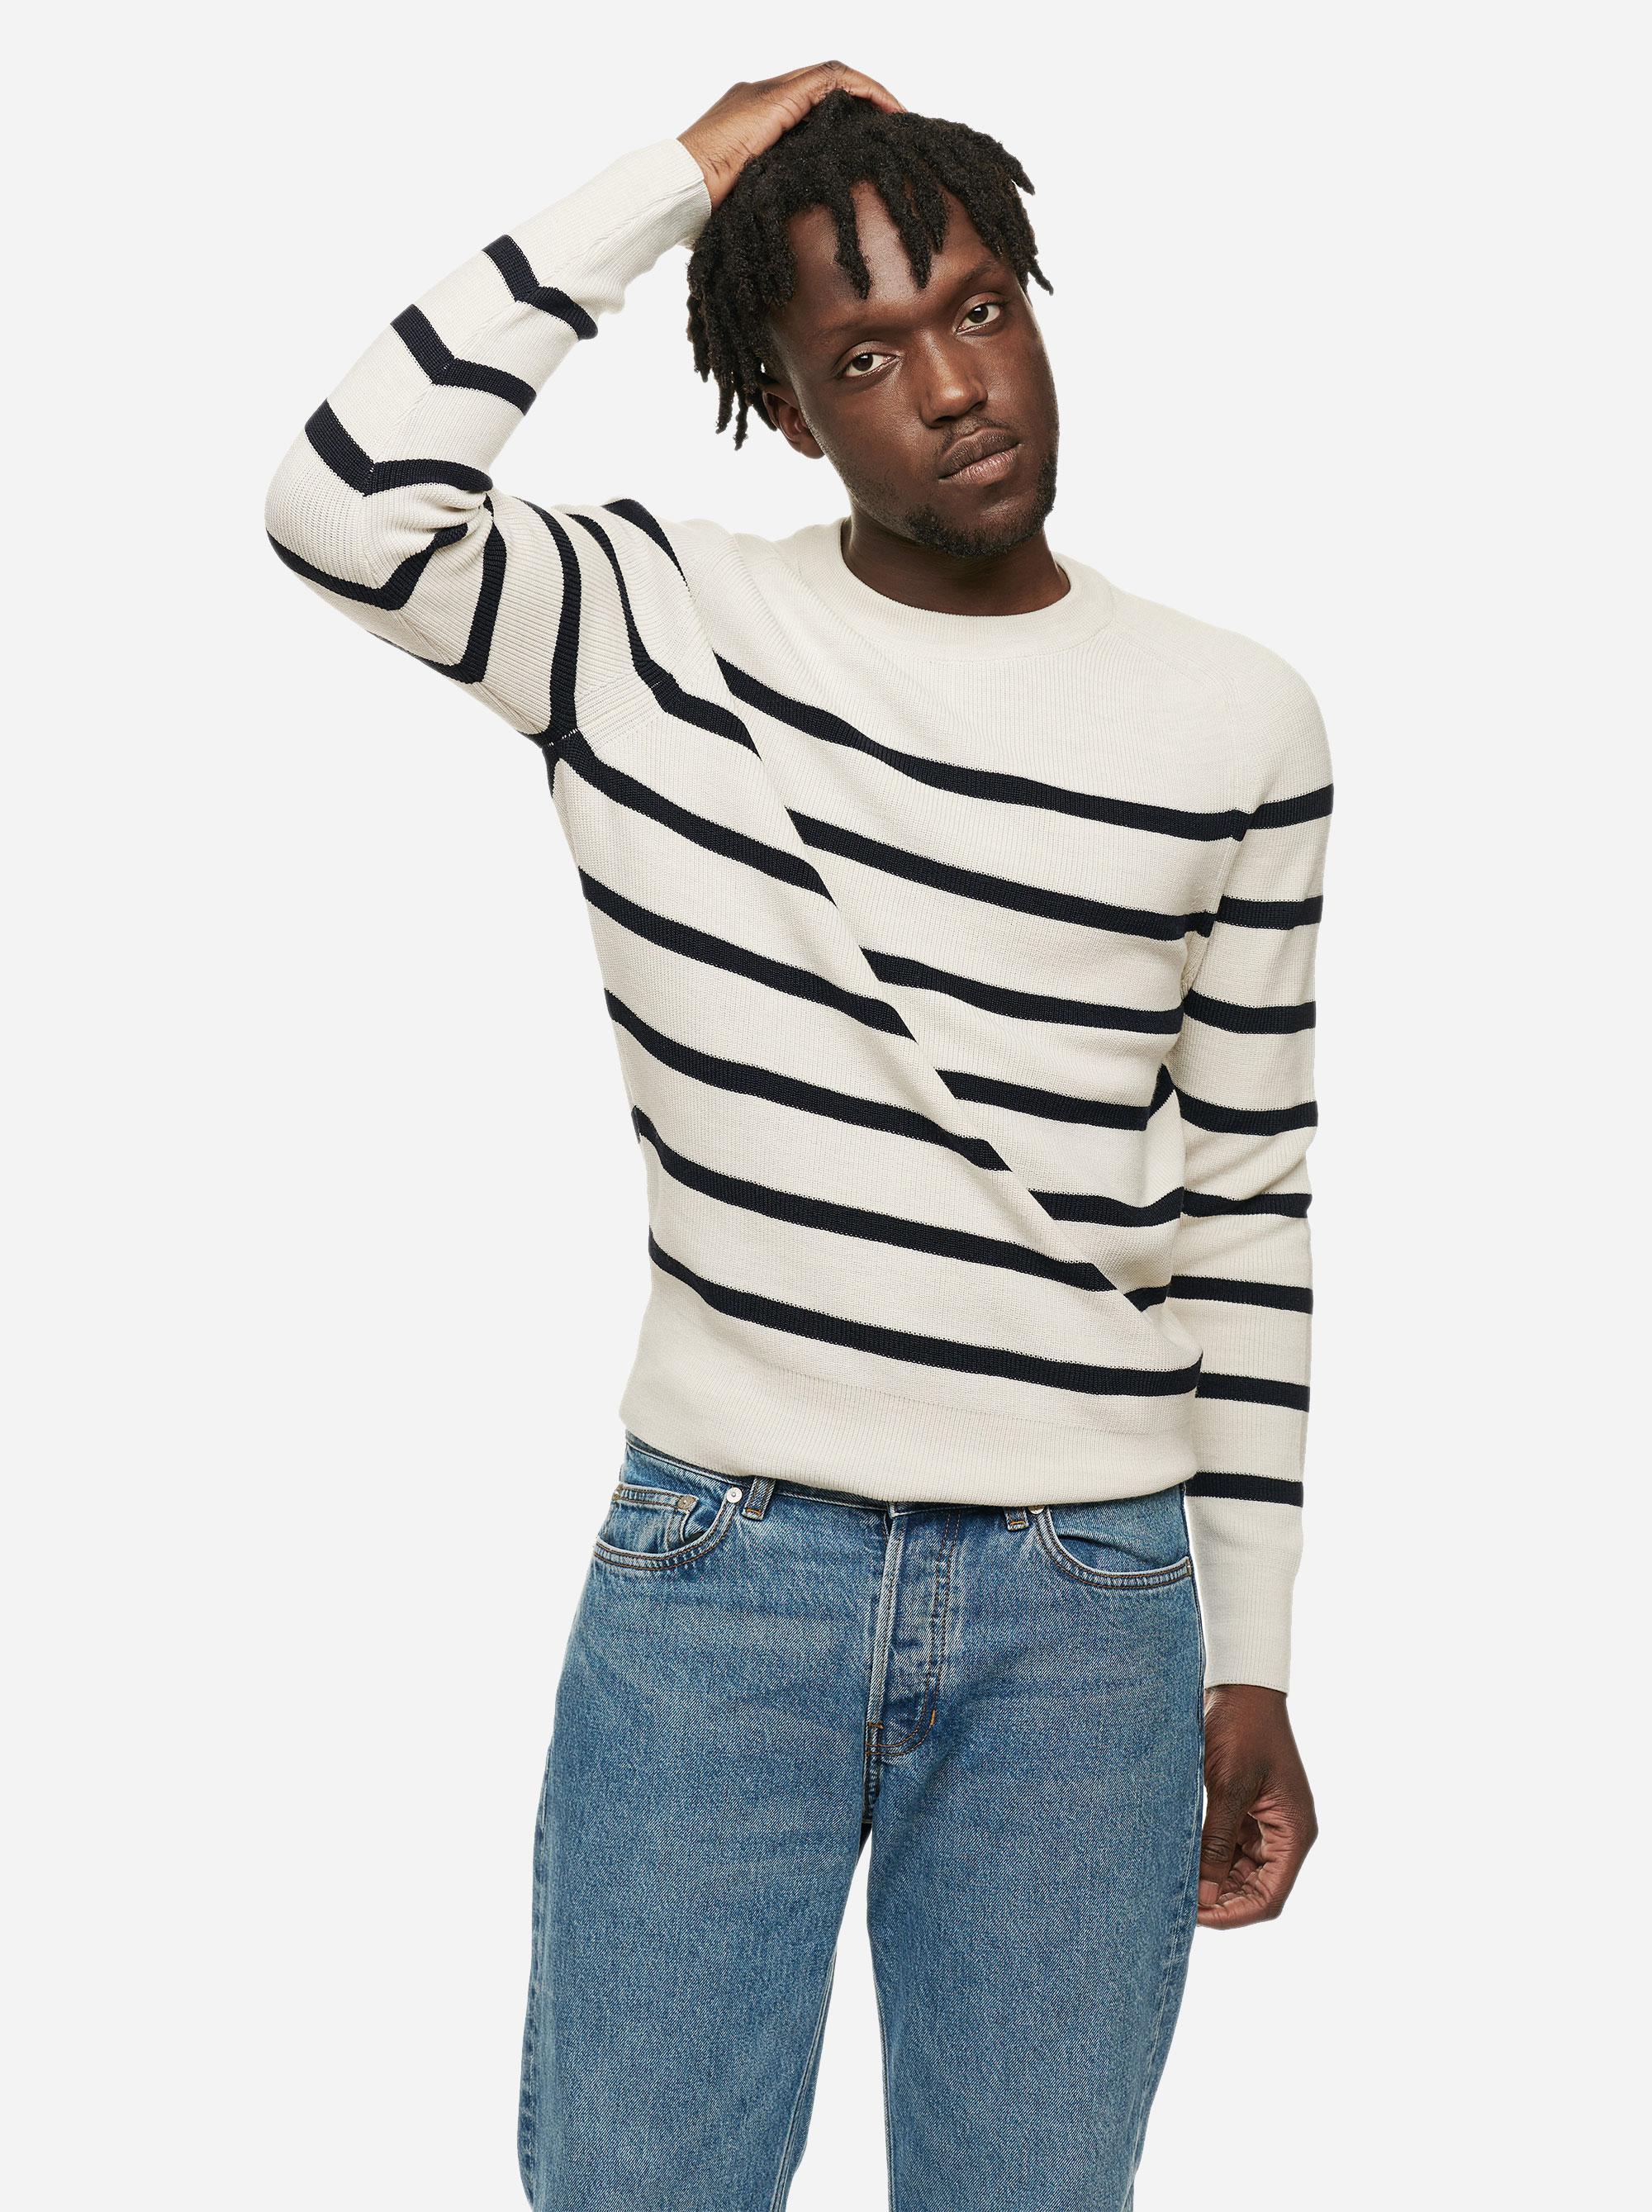 Teym - The Merino Sweater - Men - Striped - 1